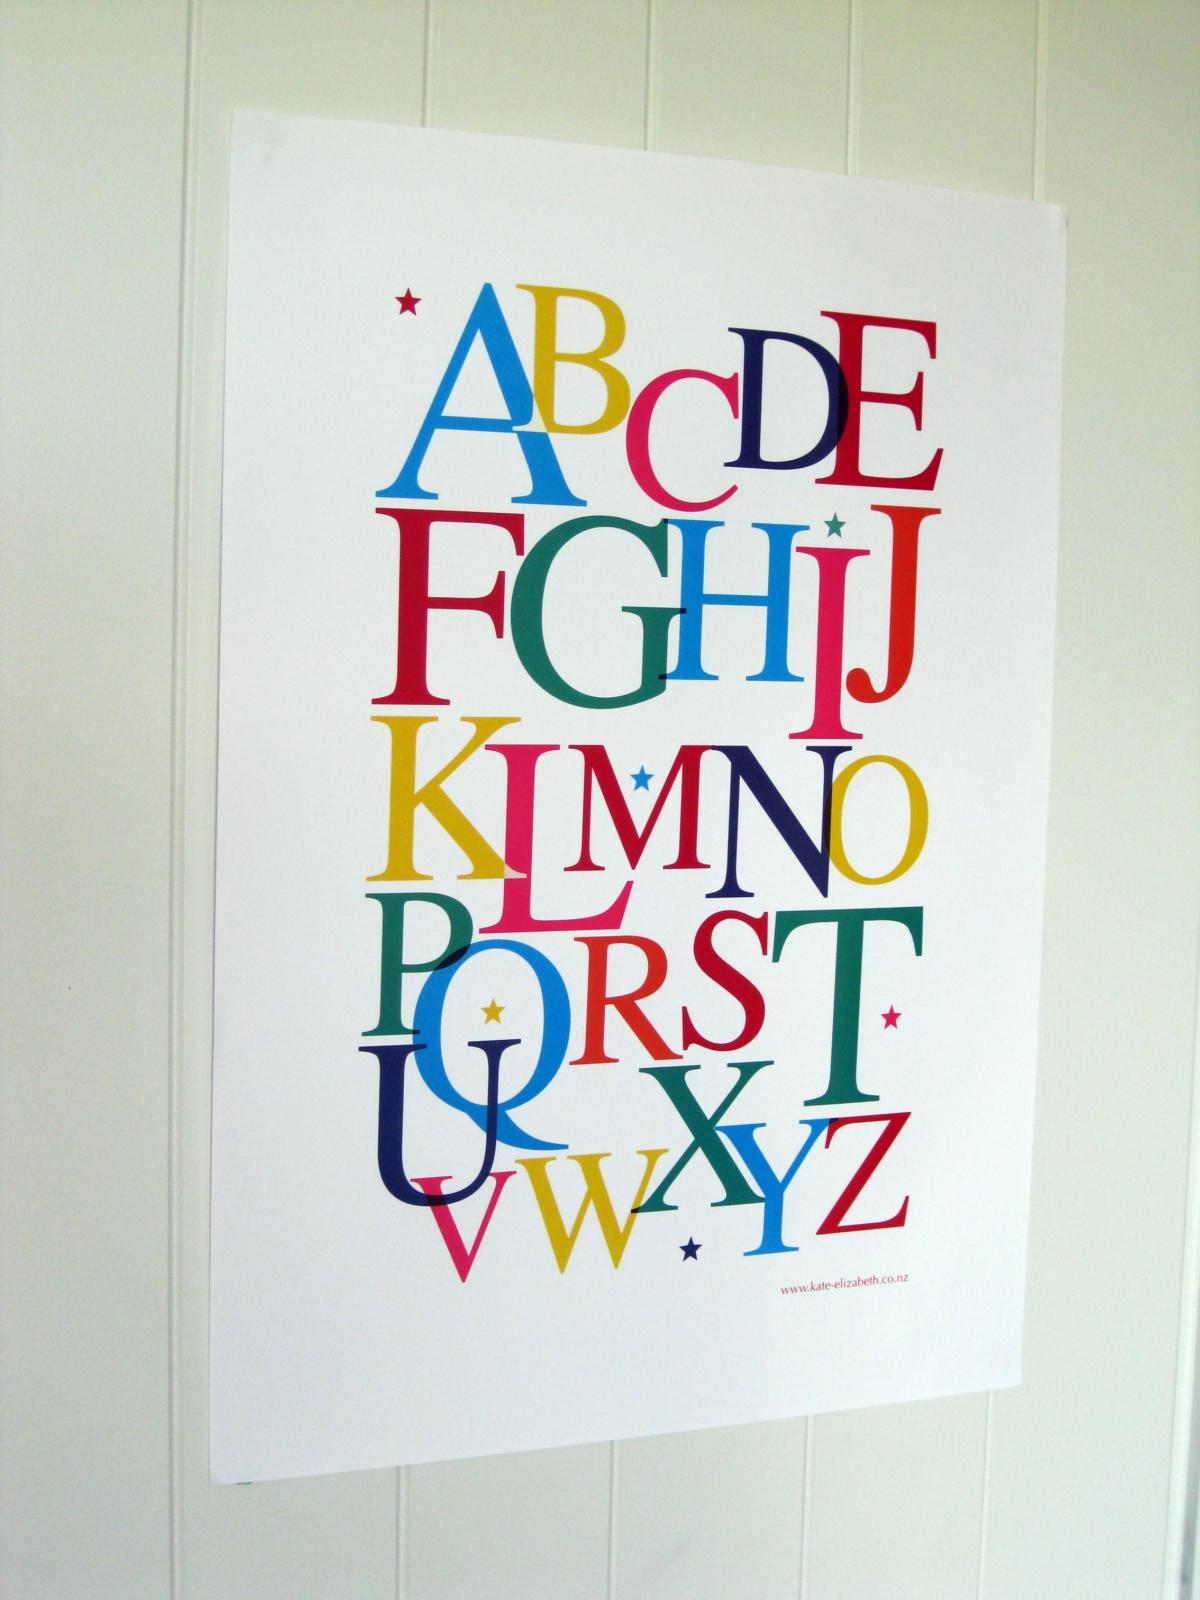 Large Abc Letters Black White: ABC Poster - Large A2 Size, Laminated.